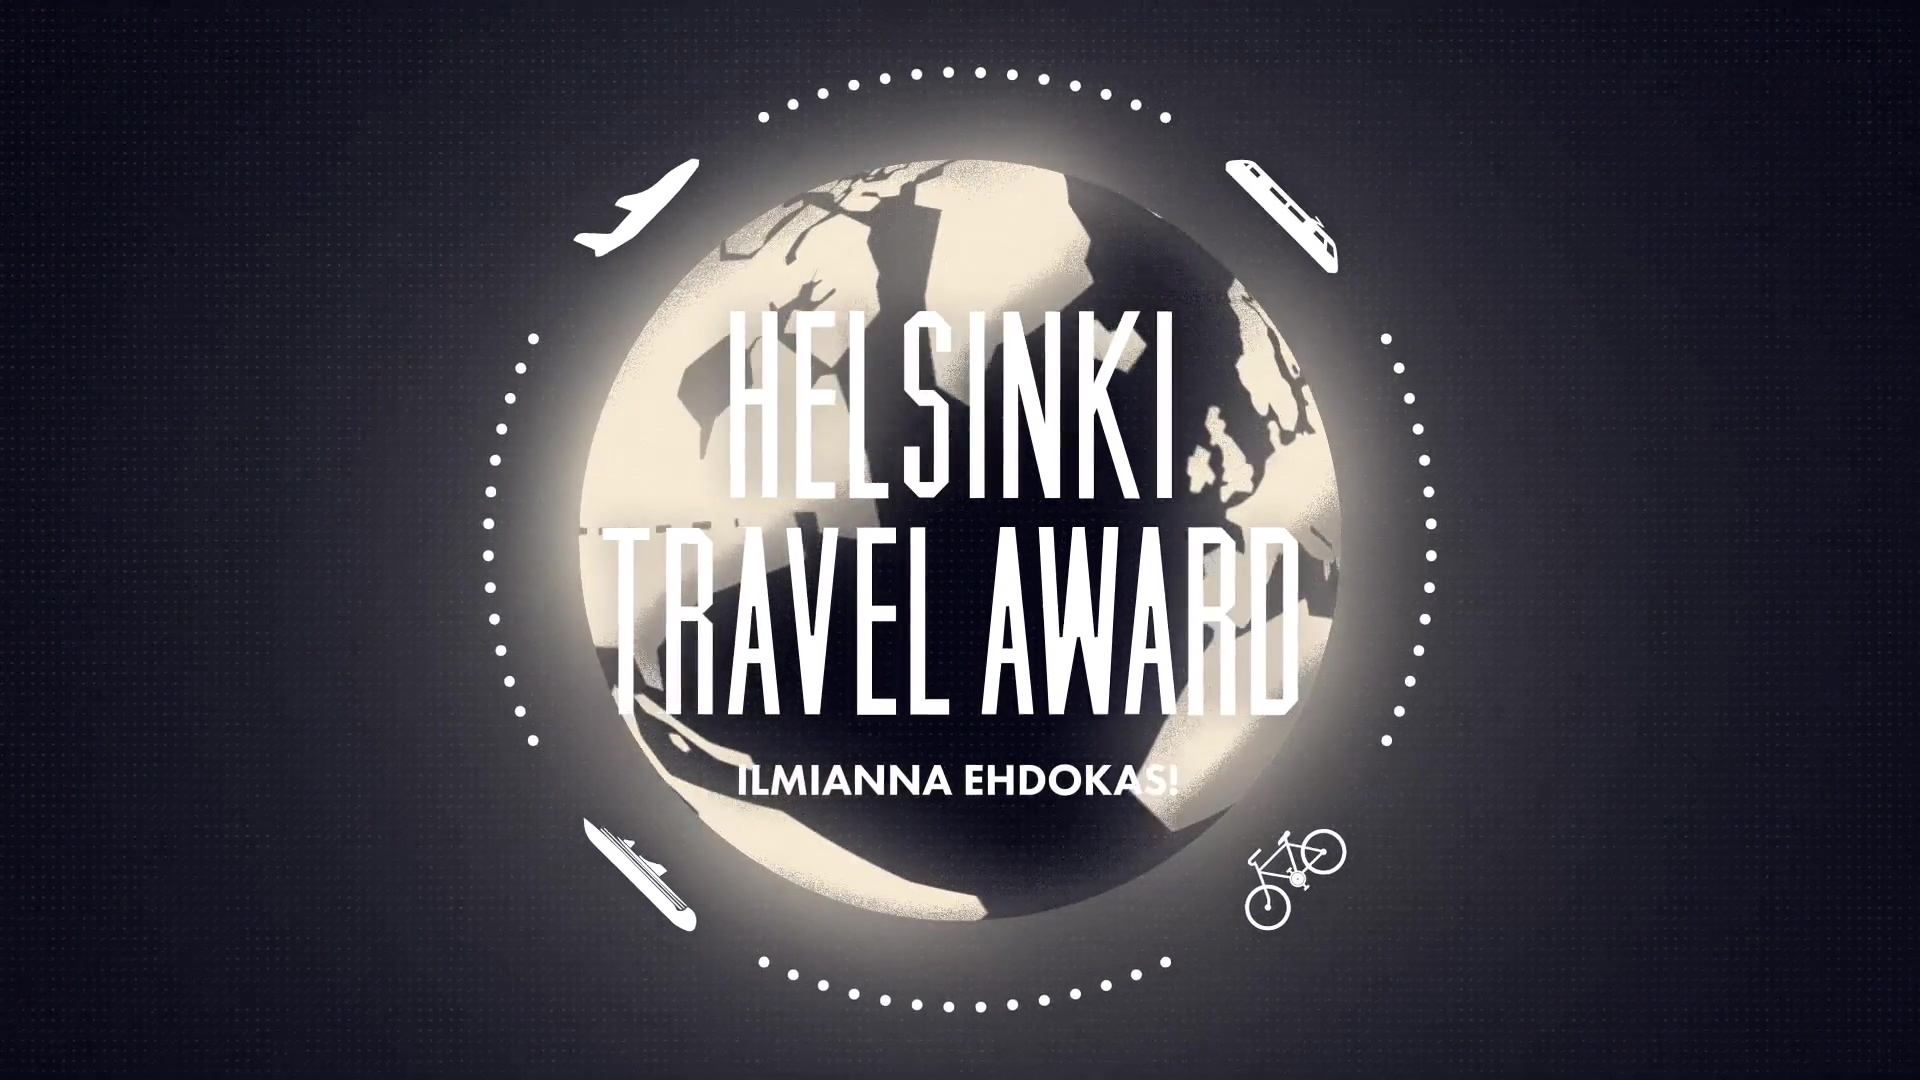 Helsinki Travel Award